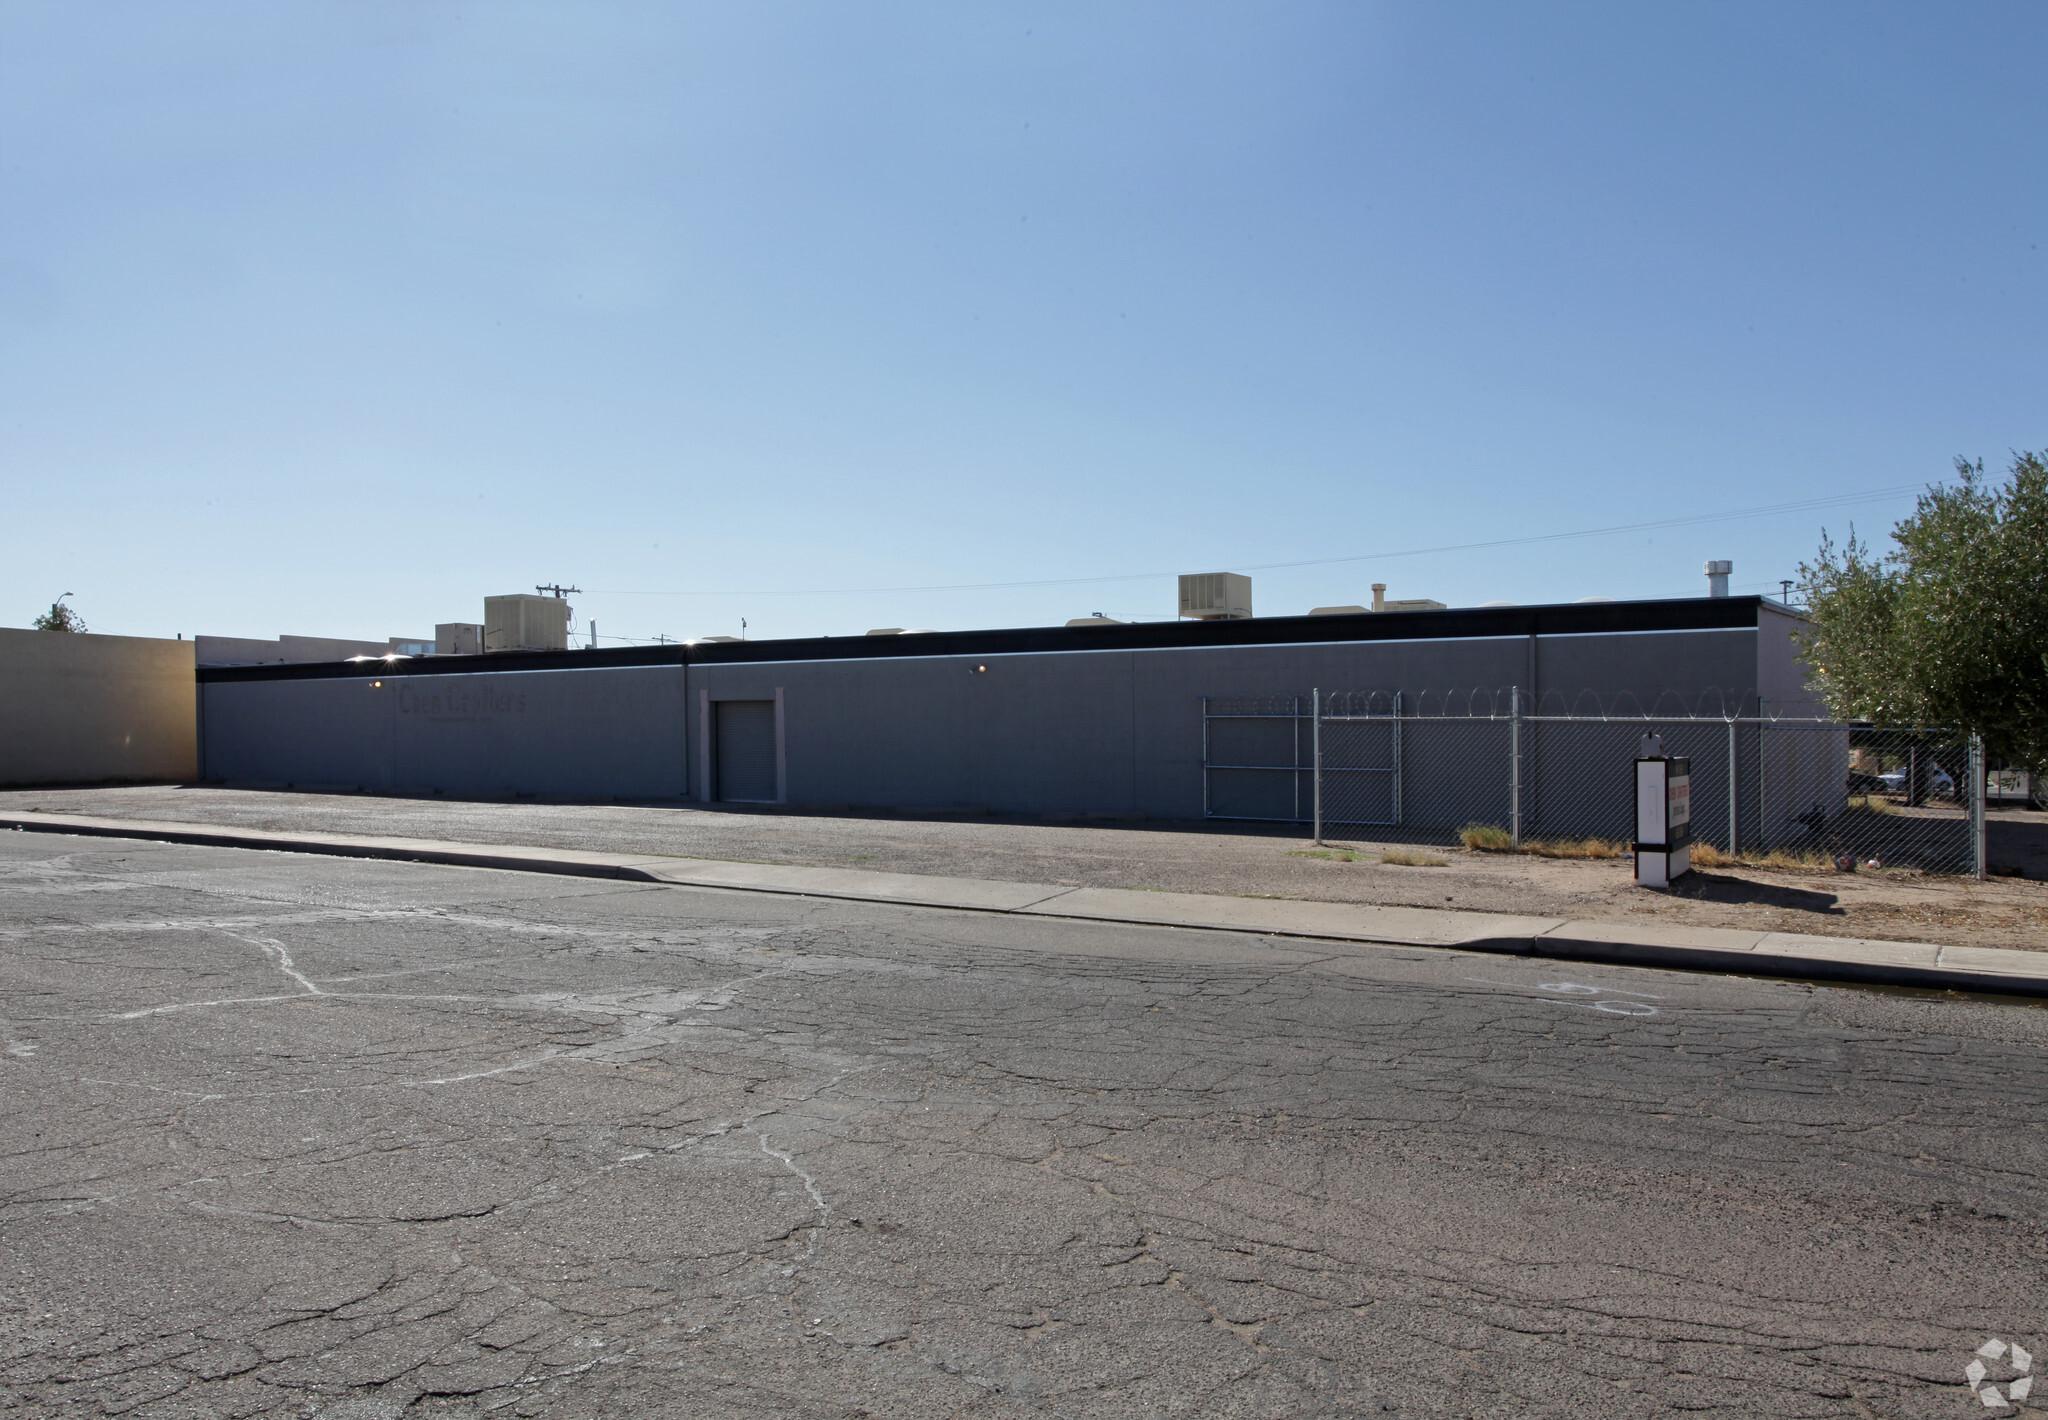 601 E 1st St, Casa Grande AZ 85122 Industrial Building